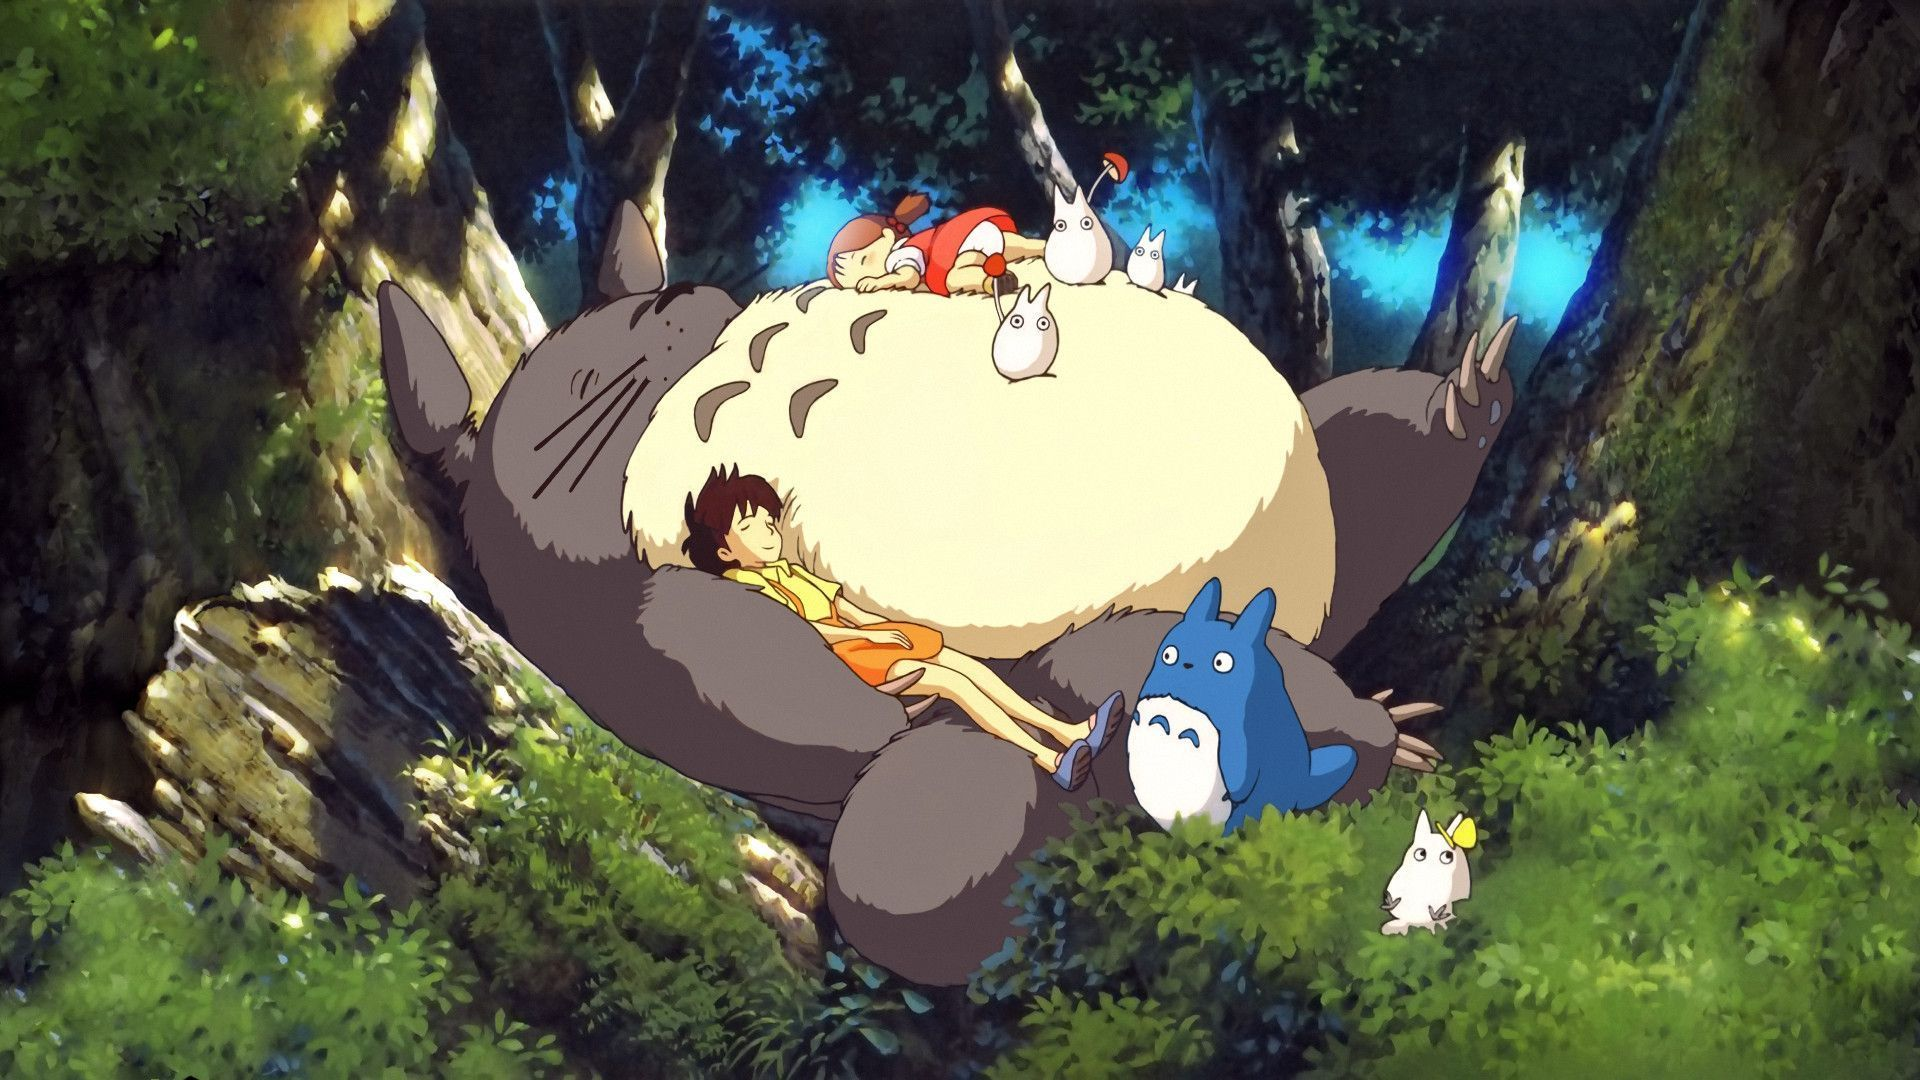 My Neighbor Totoro Wallpapers HD Download 1920×1080 Totoro